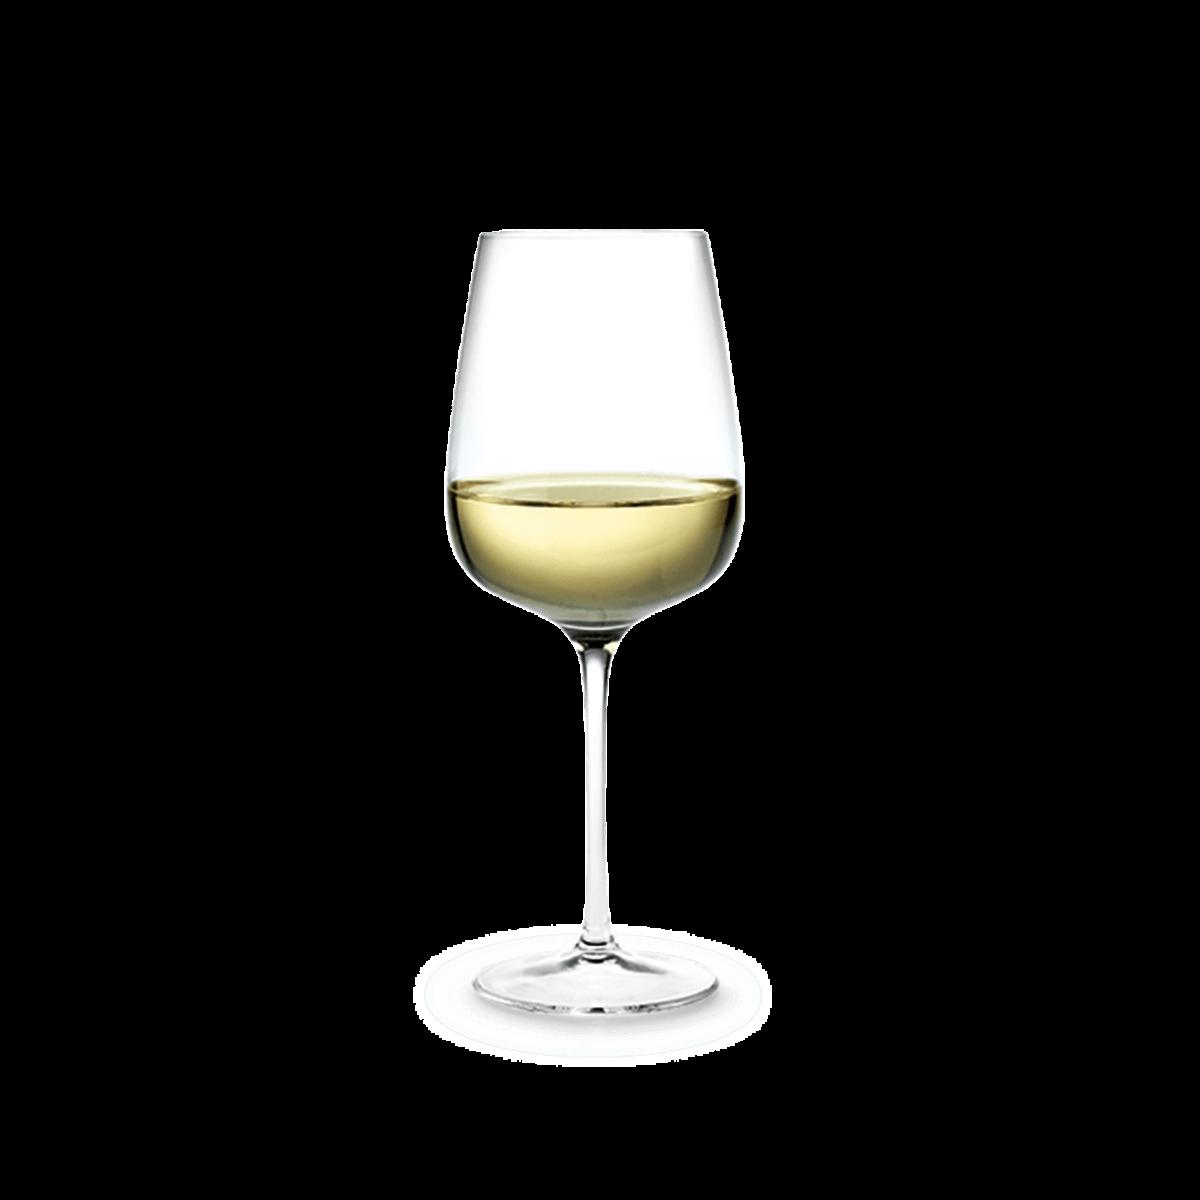 Dessert Wine Glass Png